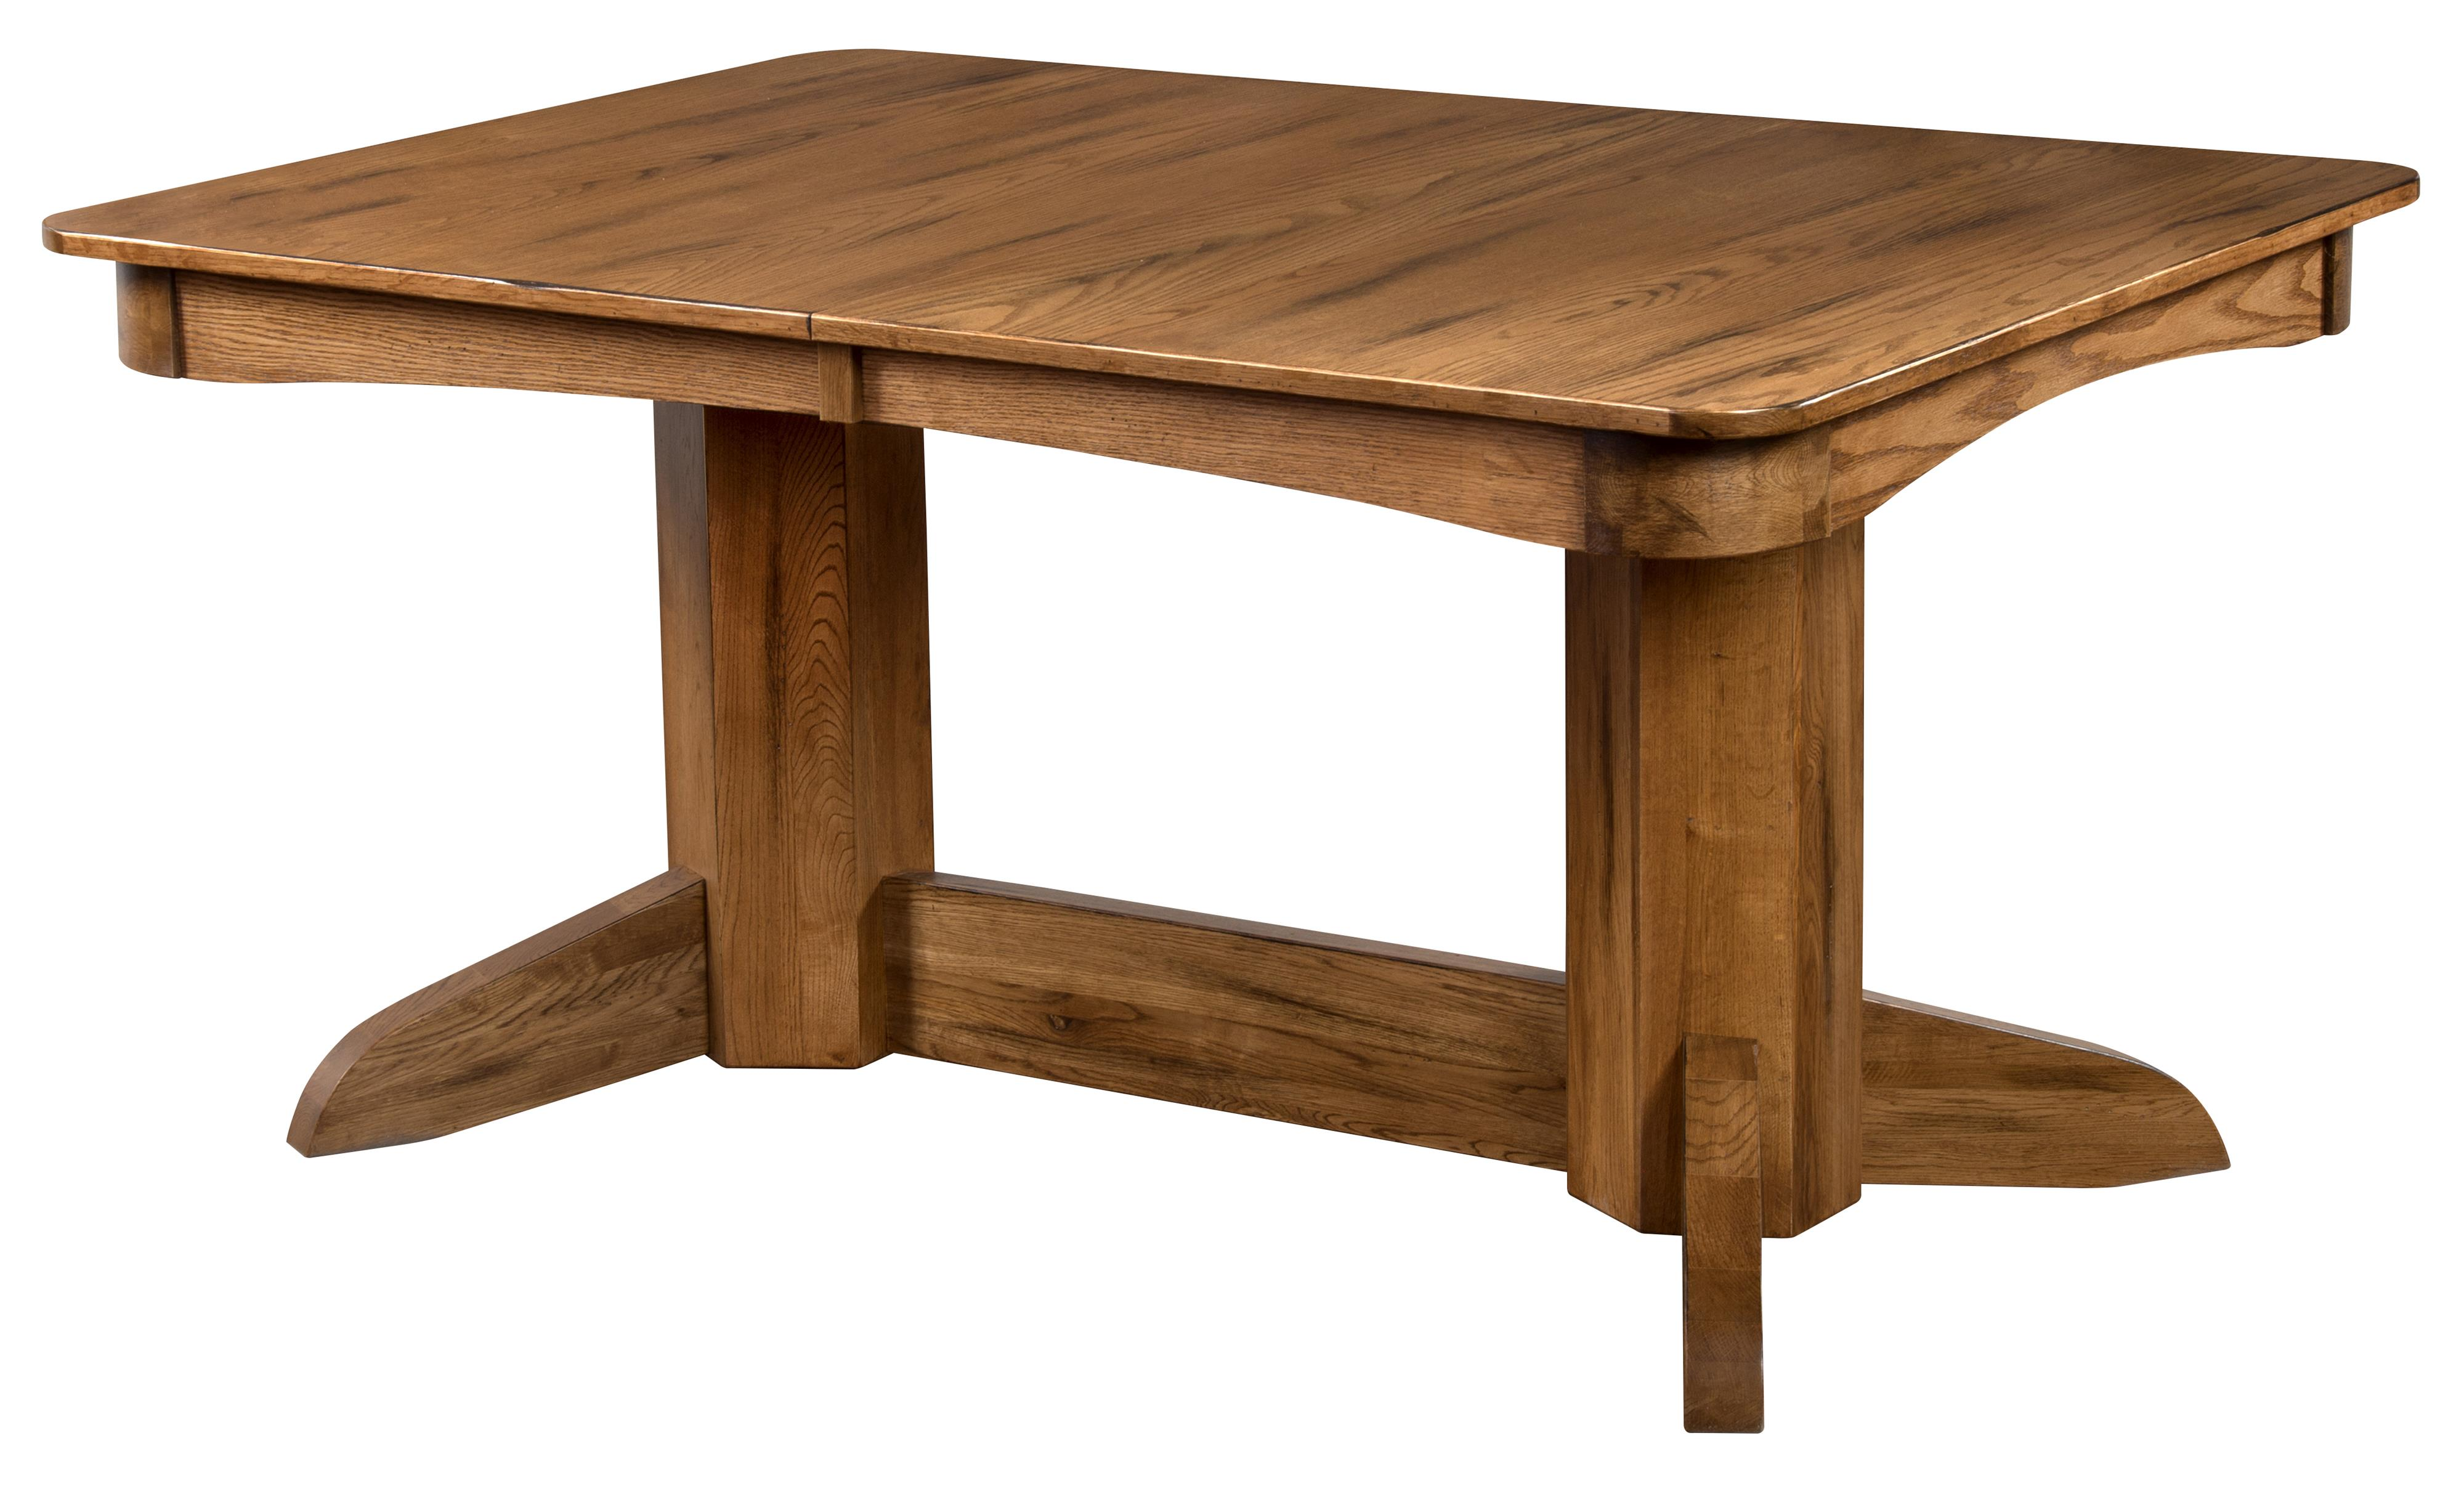 Sunny Designs Sedona Rustic Oak Trestle Table W 2 Leaves Fashion Furniture Dining Tables